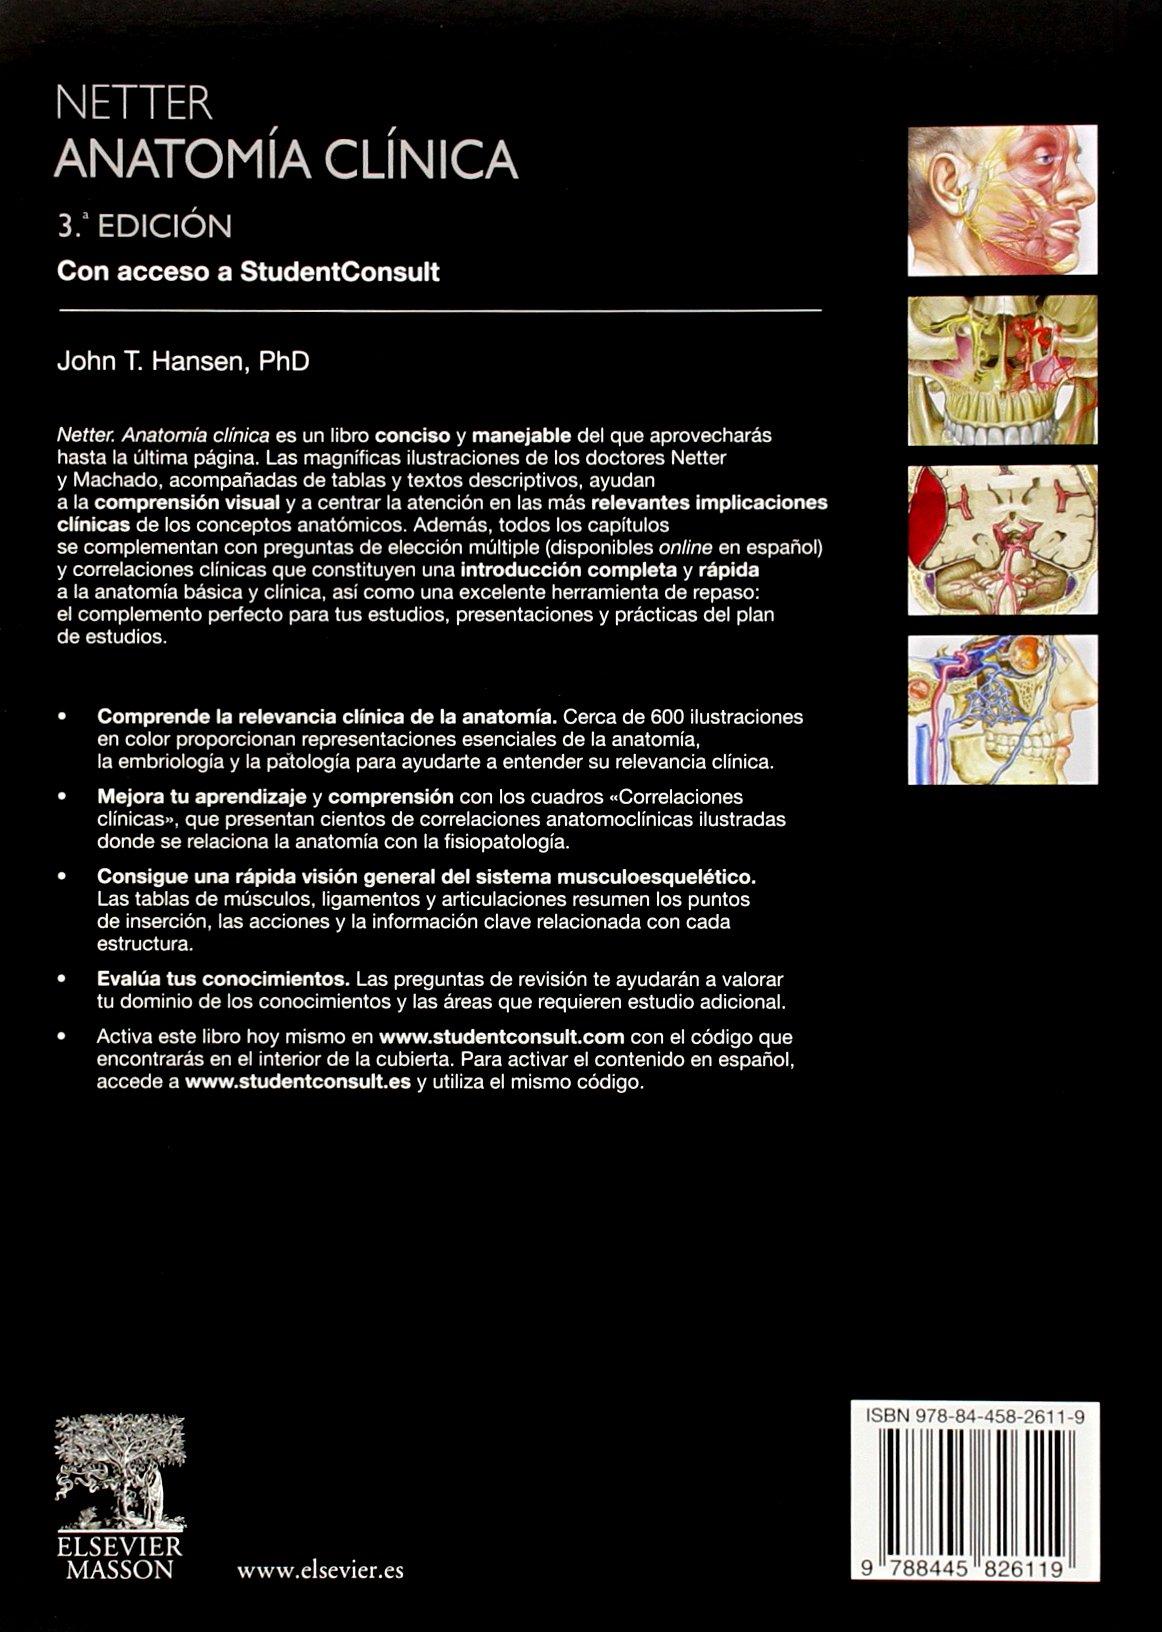 Netter. Anatomía Clínica - 3ª Edición + 2 StudentConsult: Amazon.es ...